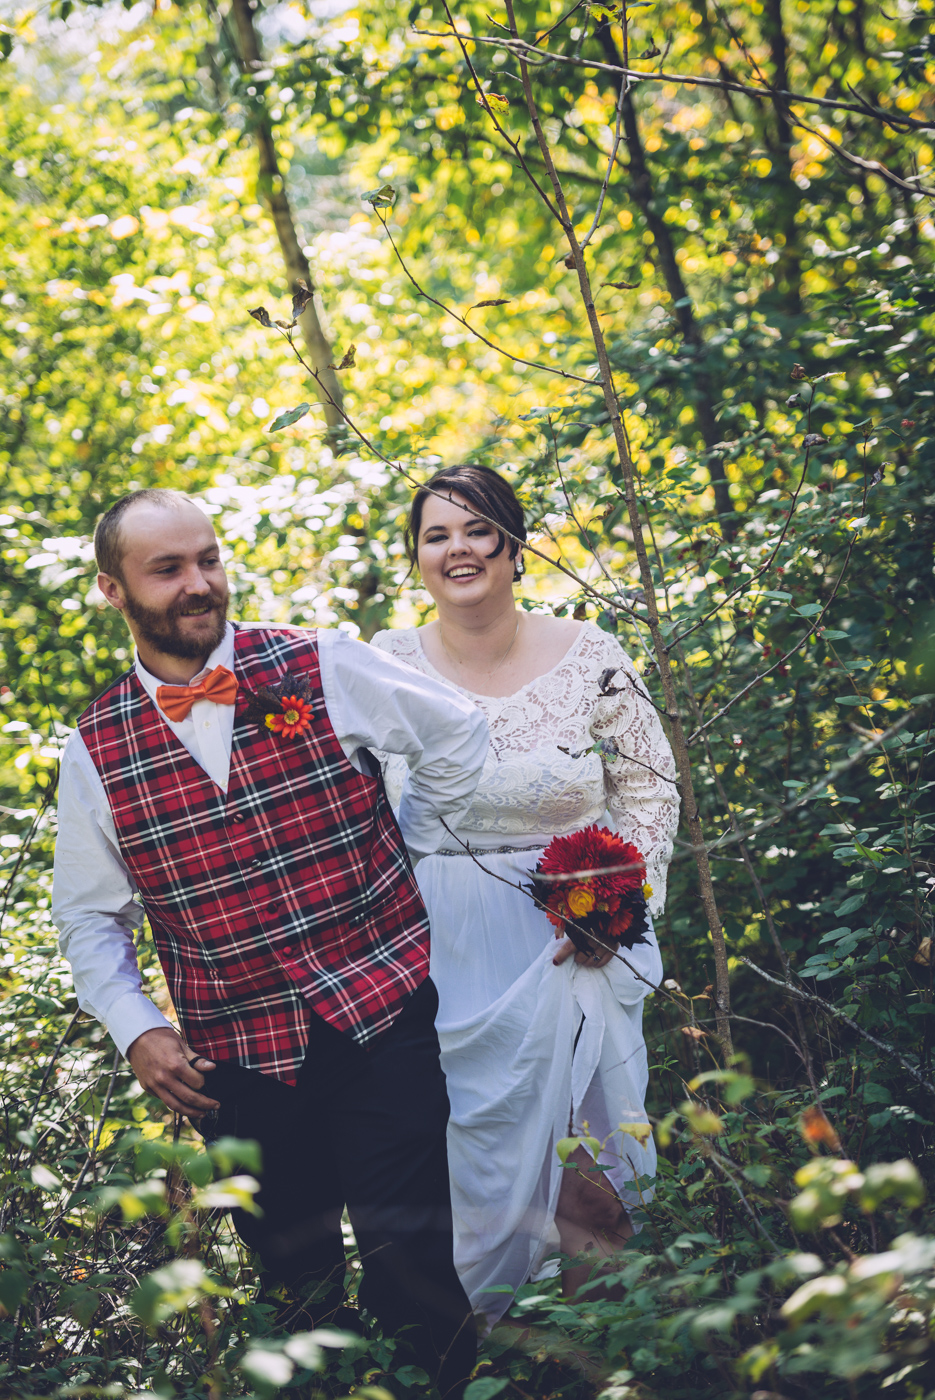 adam_eden_wedding_blog23.jpg